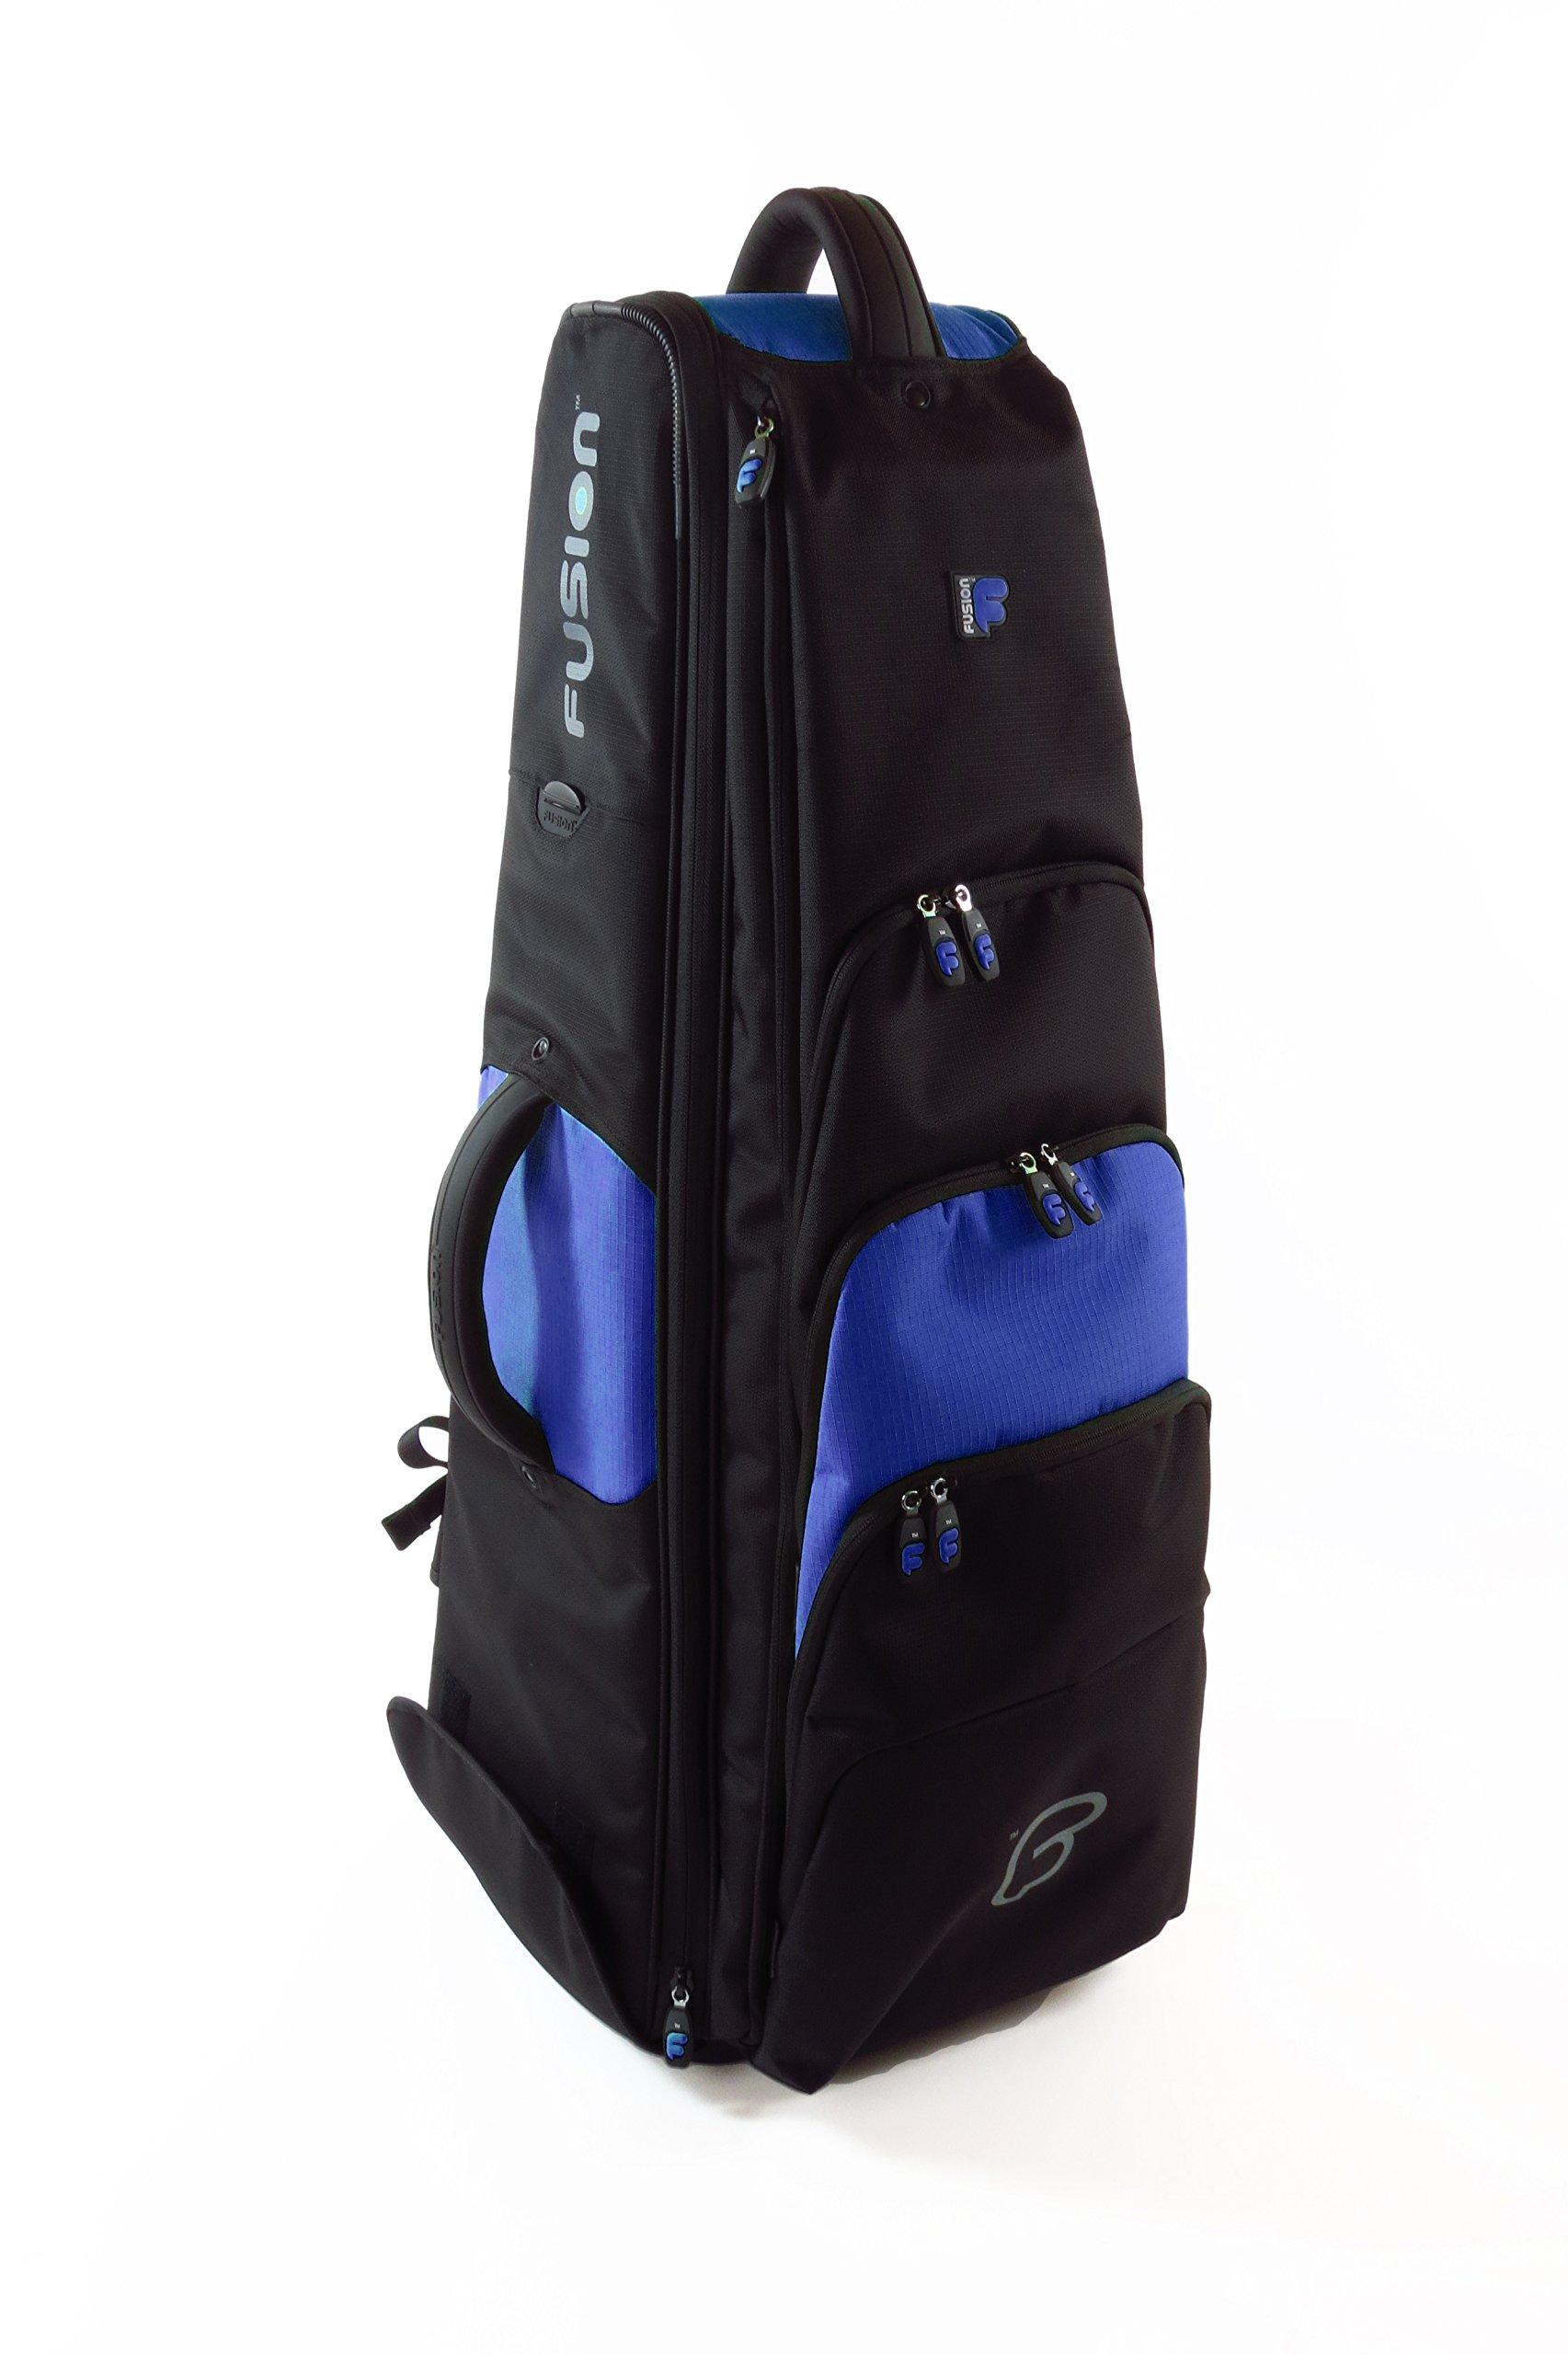 Fusion PB-16-B Premium 10.5-Inch Bass Trombone Gig Bag, Black/Blue